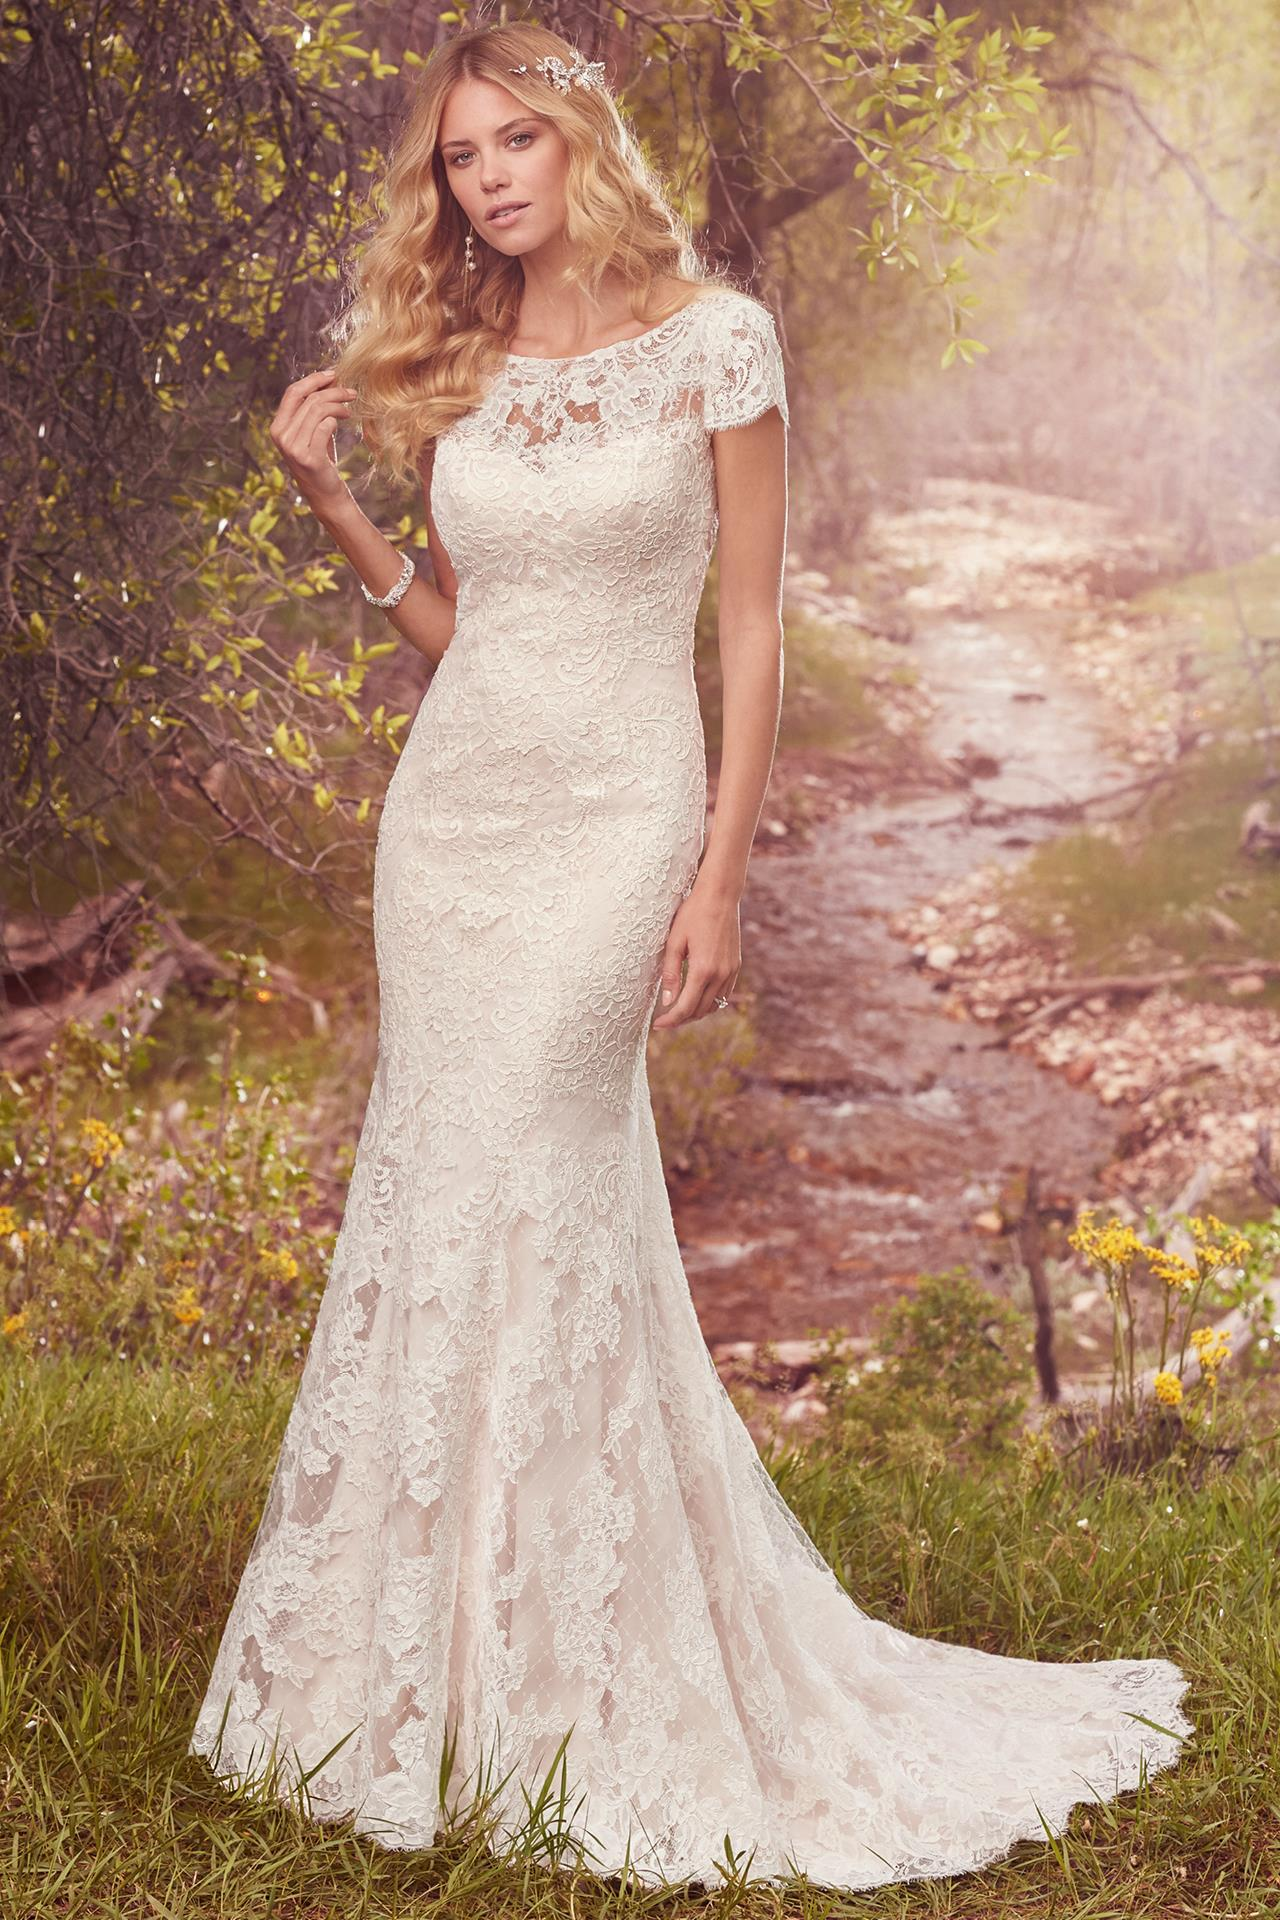 wedding dresses under 1500 photo - 1